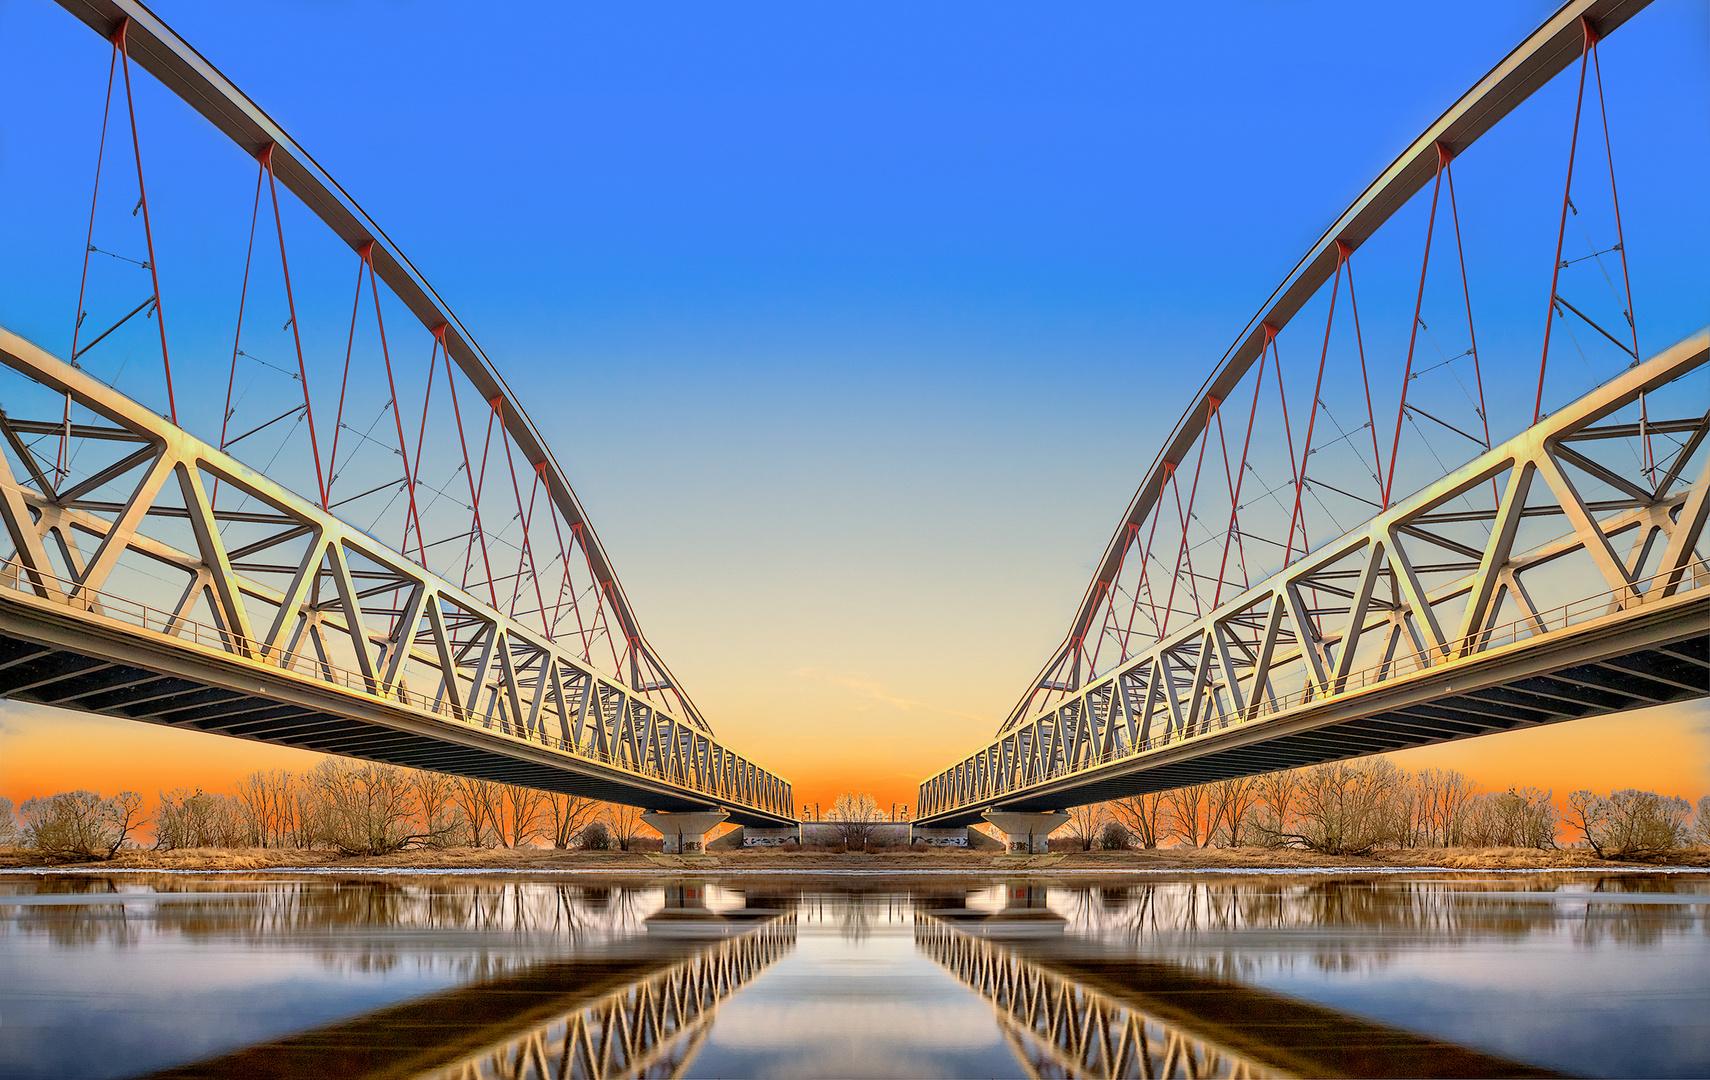 - Elbebrücke -